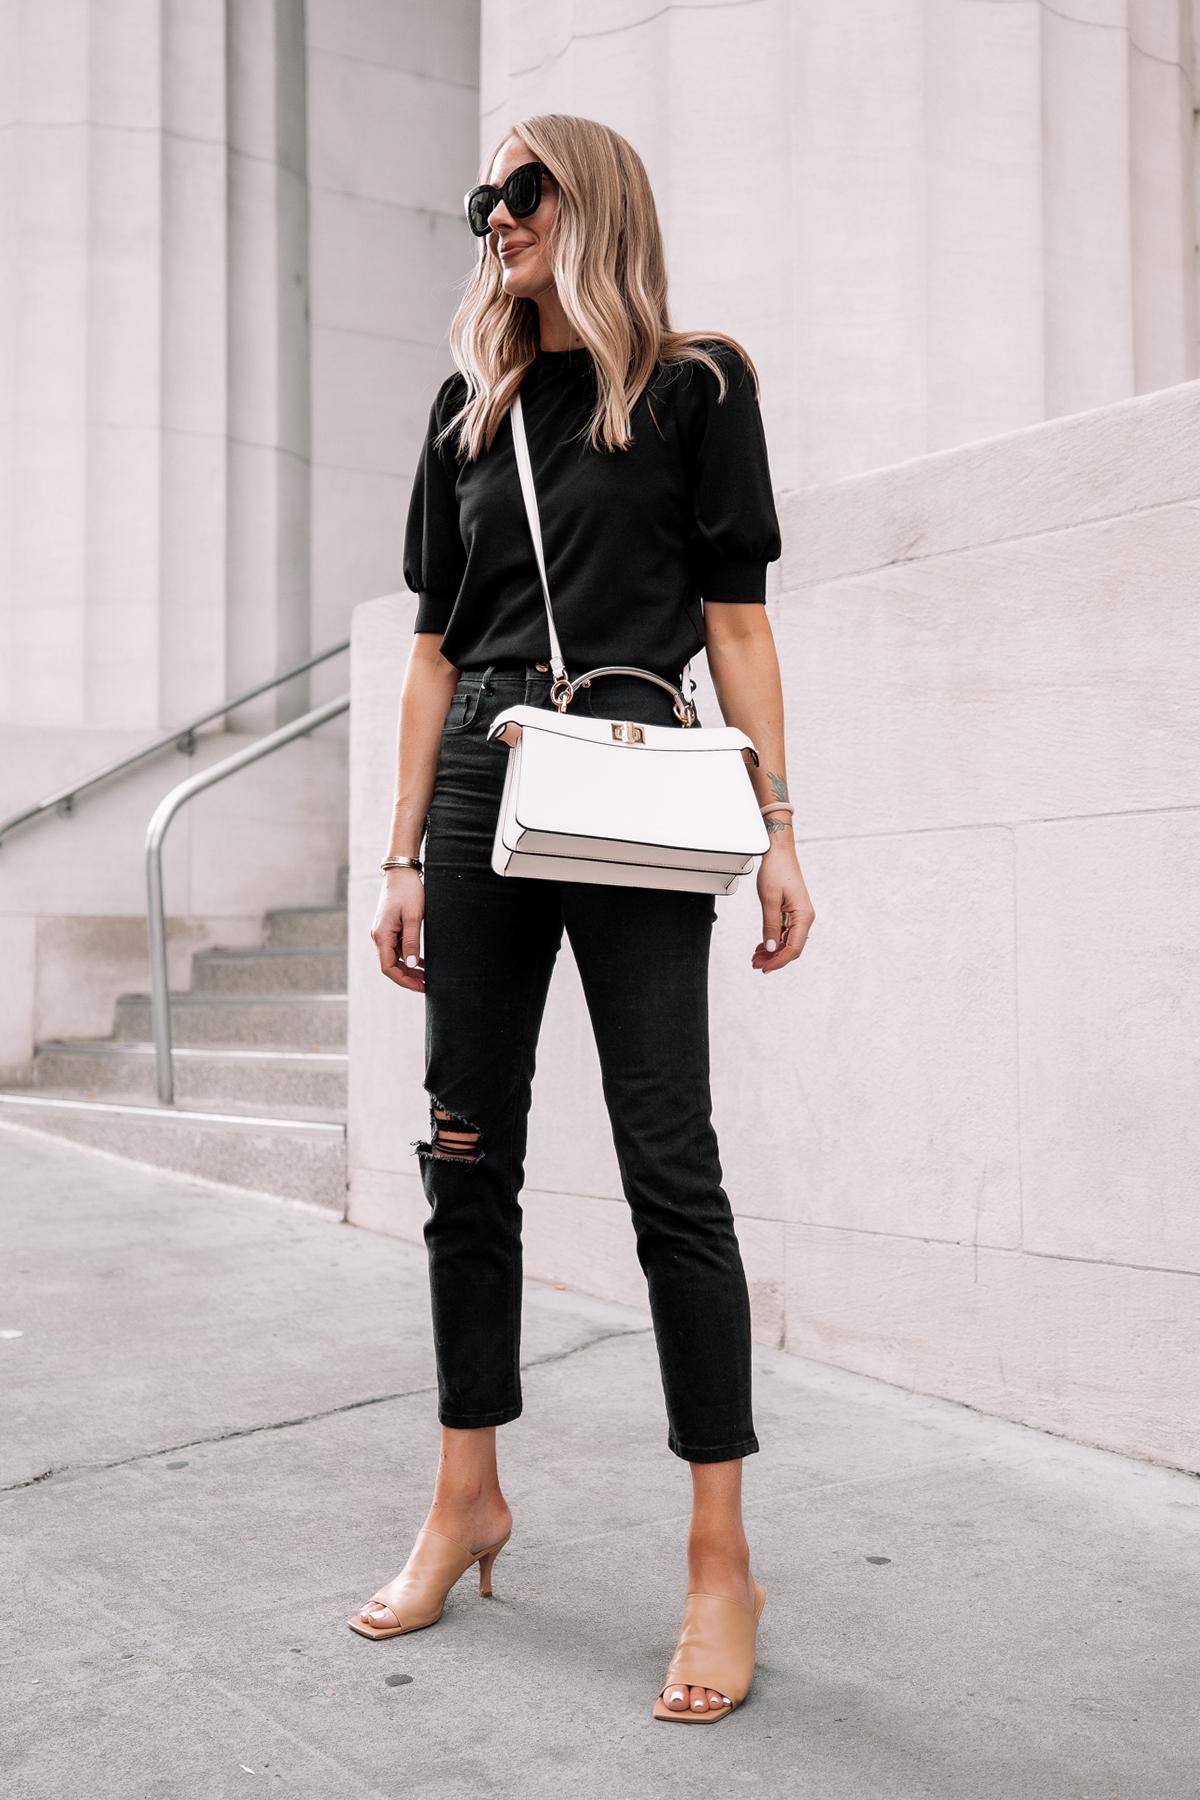 Fashion Jackson Wearing Black Top Black Ripped Jeans Nude Heeld Sandals Fendi White Peekaboo Handbag Street Style 2